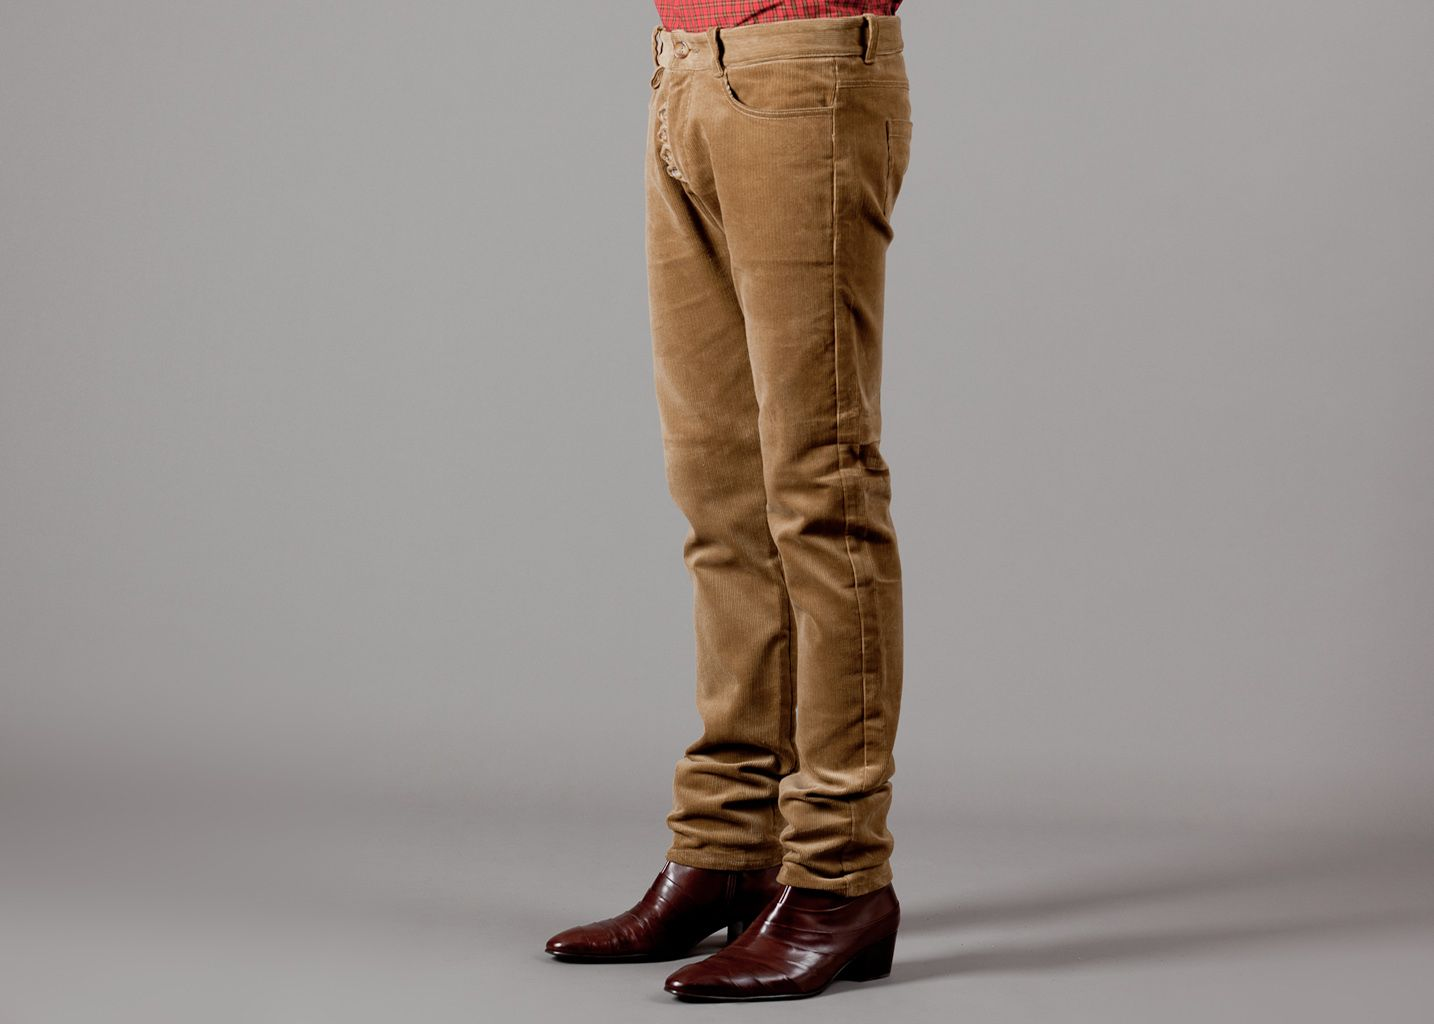 Pantalon en velours Arthur - Les Chats Perchés